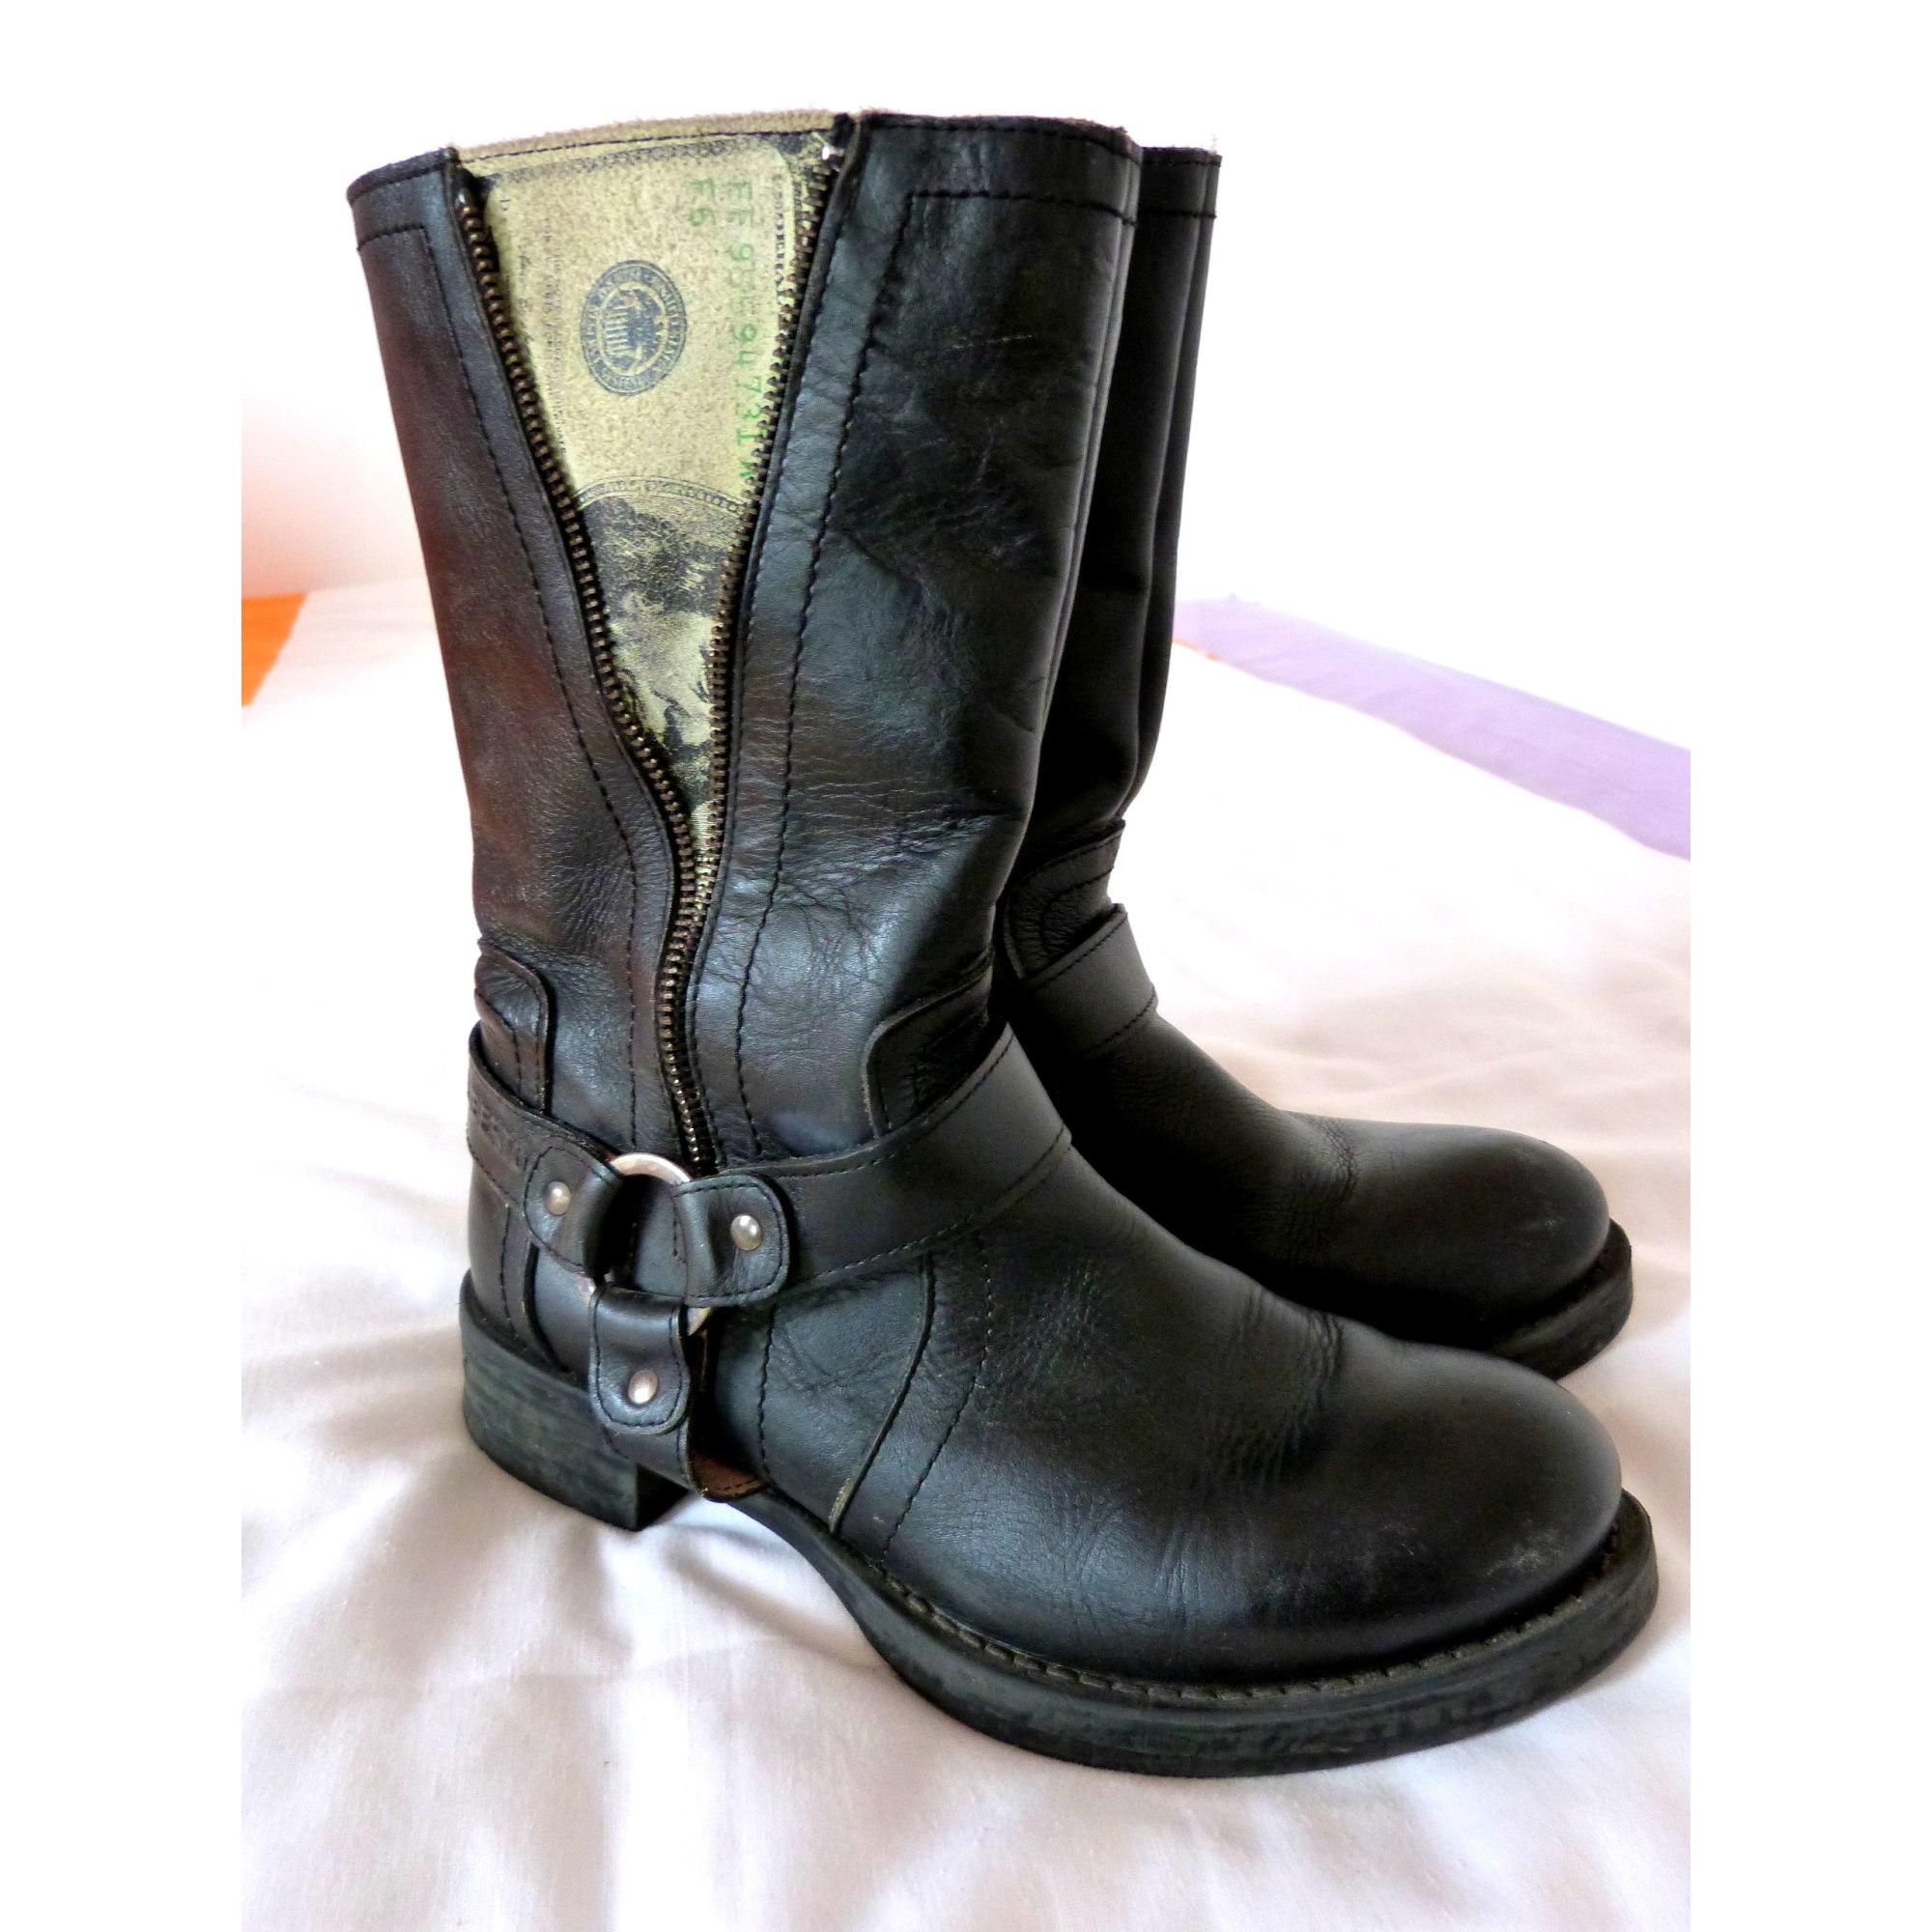 Santiagsbottineslow Santiagsbottineslow boots cowboy Santiagsbottineslow Santiagsbottineslow cowboy boots boots cowboy cowboy boots kZuPiTOX